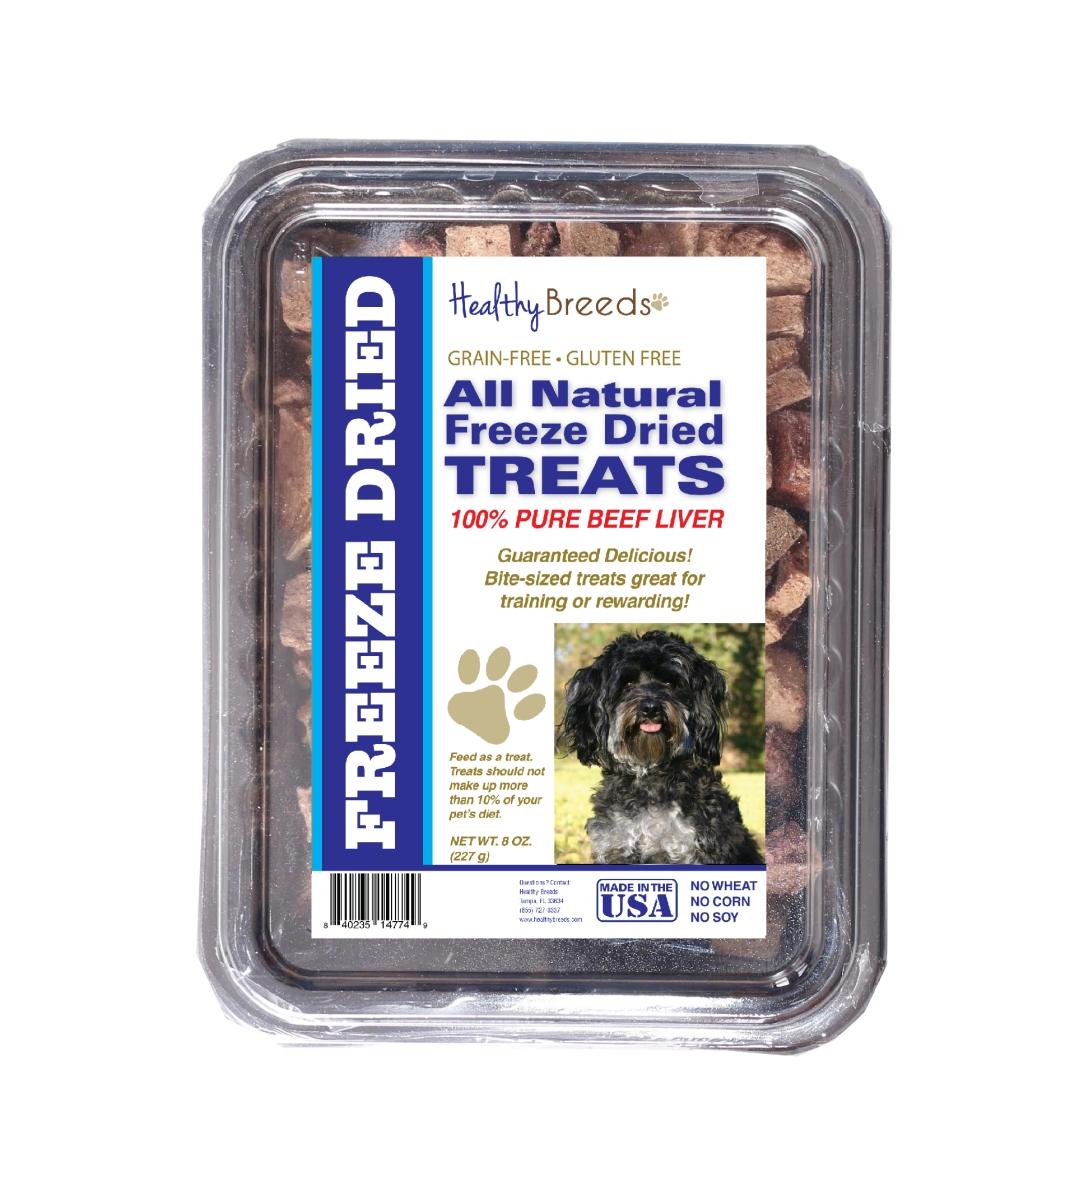 Healthy Breeds 840235147381 10 oz Maltipoo All Natural Freeze Dried Treats Beef Liver